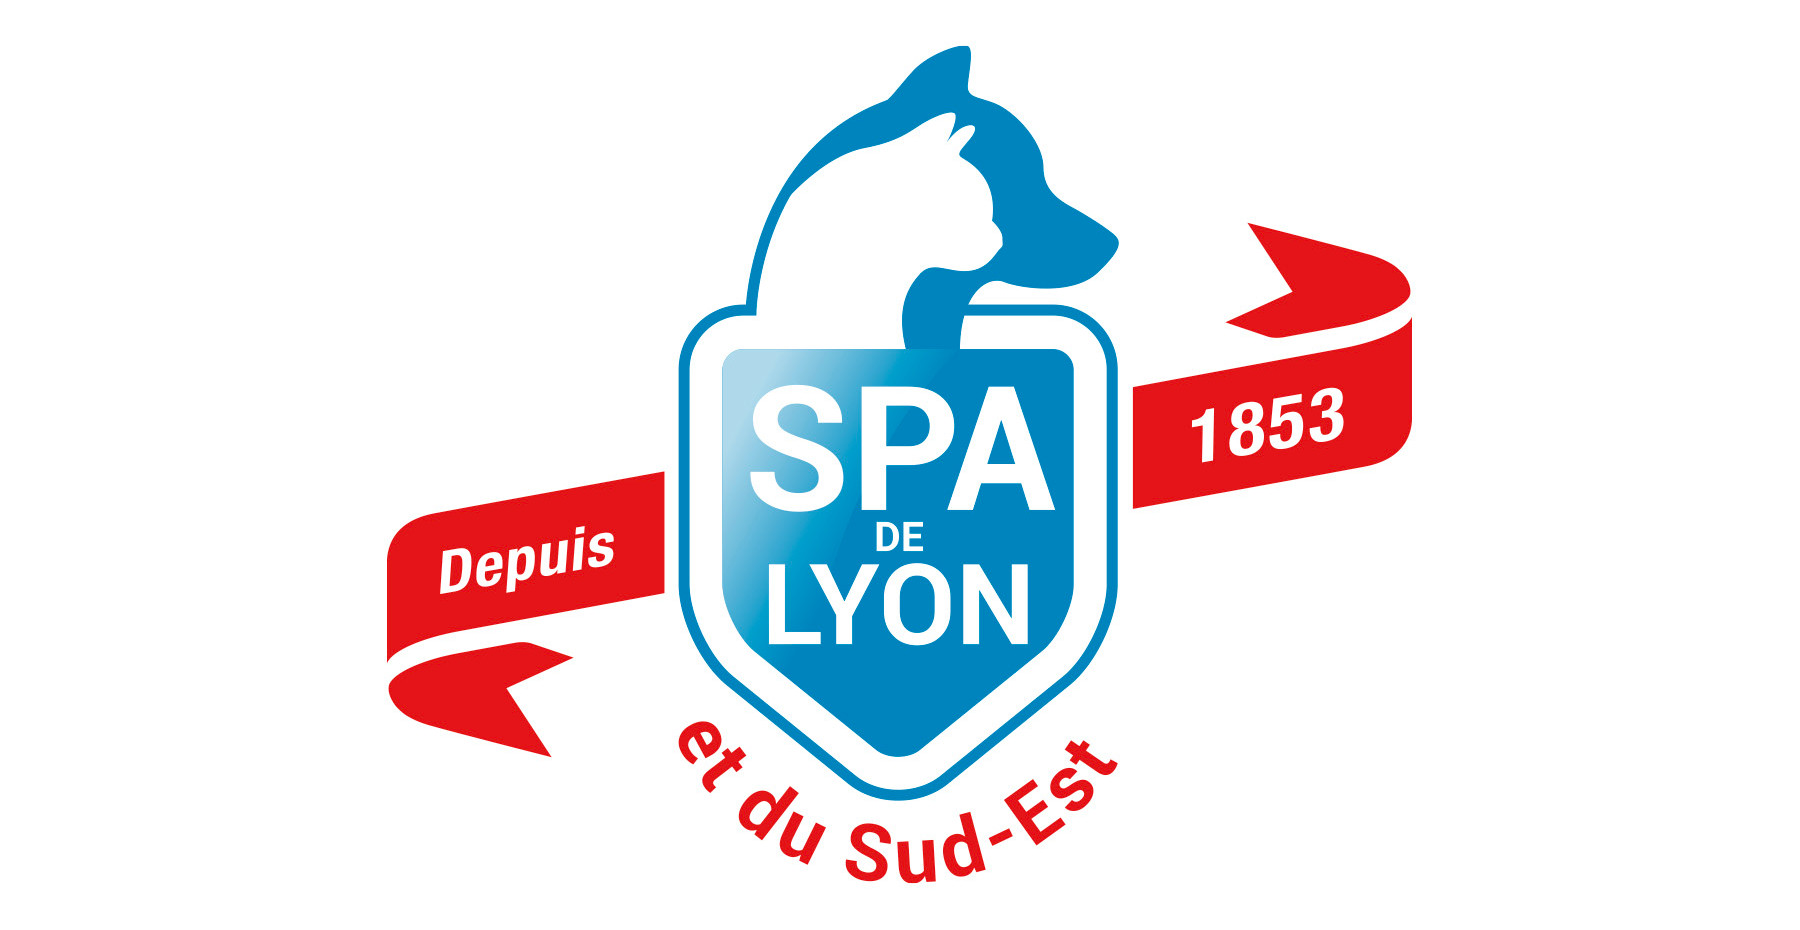 SPA_logo2_web.jpg